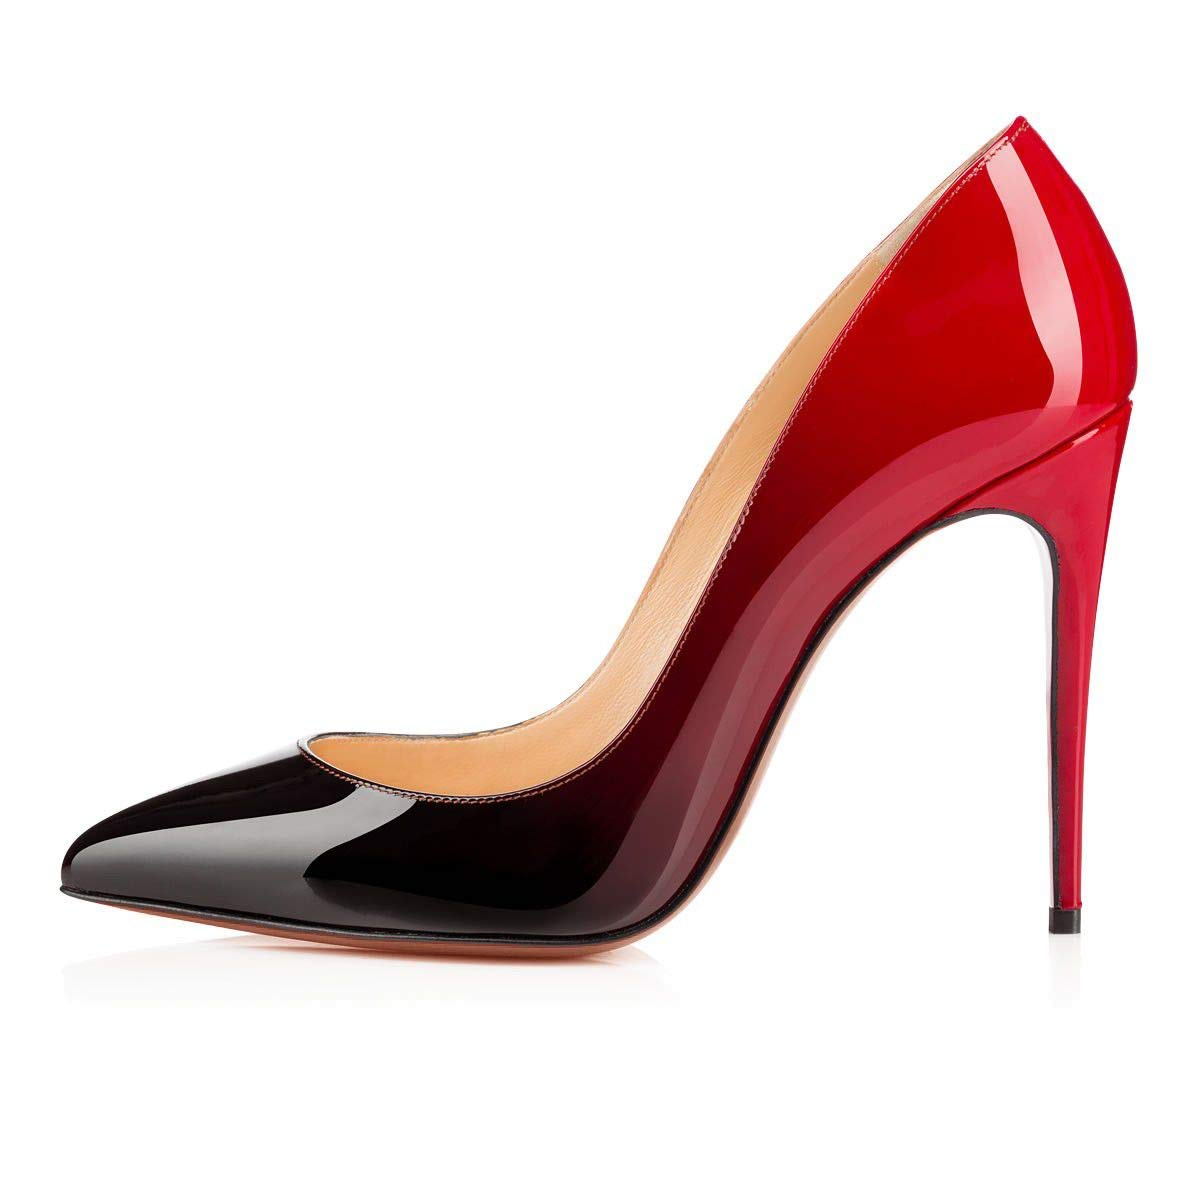 RedBlack Heels Addict's Women's shoes Pointed Toe Gradient Patent Leather Stiletto Heels Pumps